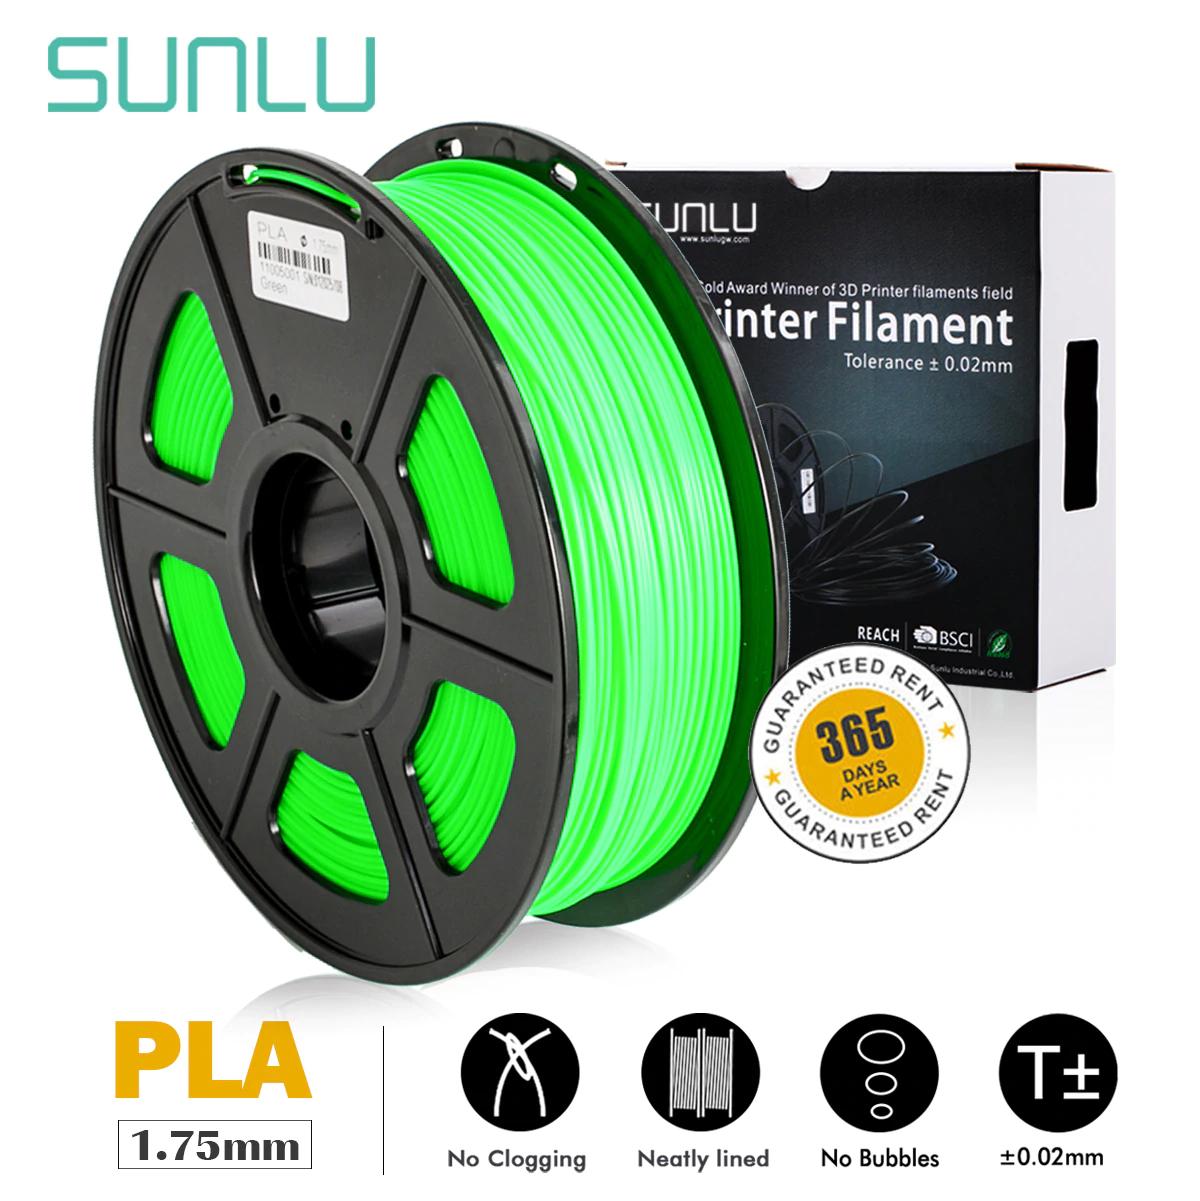 Sunlu Filament PLA / PETG / ABS / TPU 1kg ab 13,49 € - Versand aus Deutschland